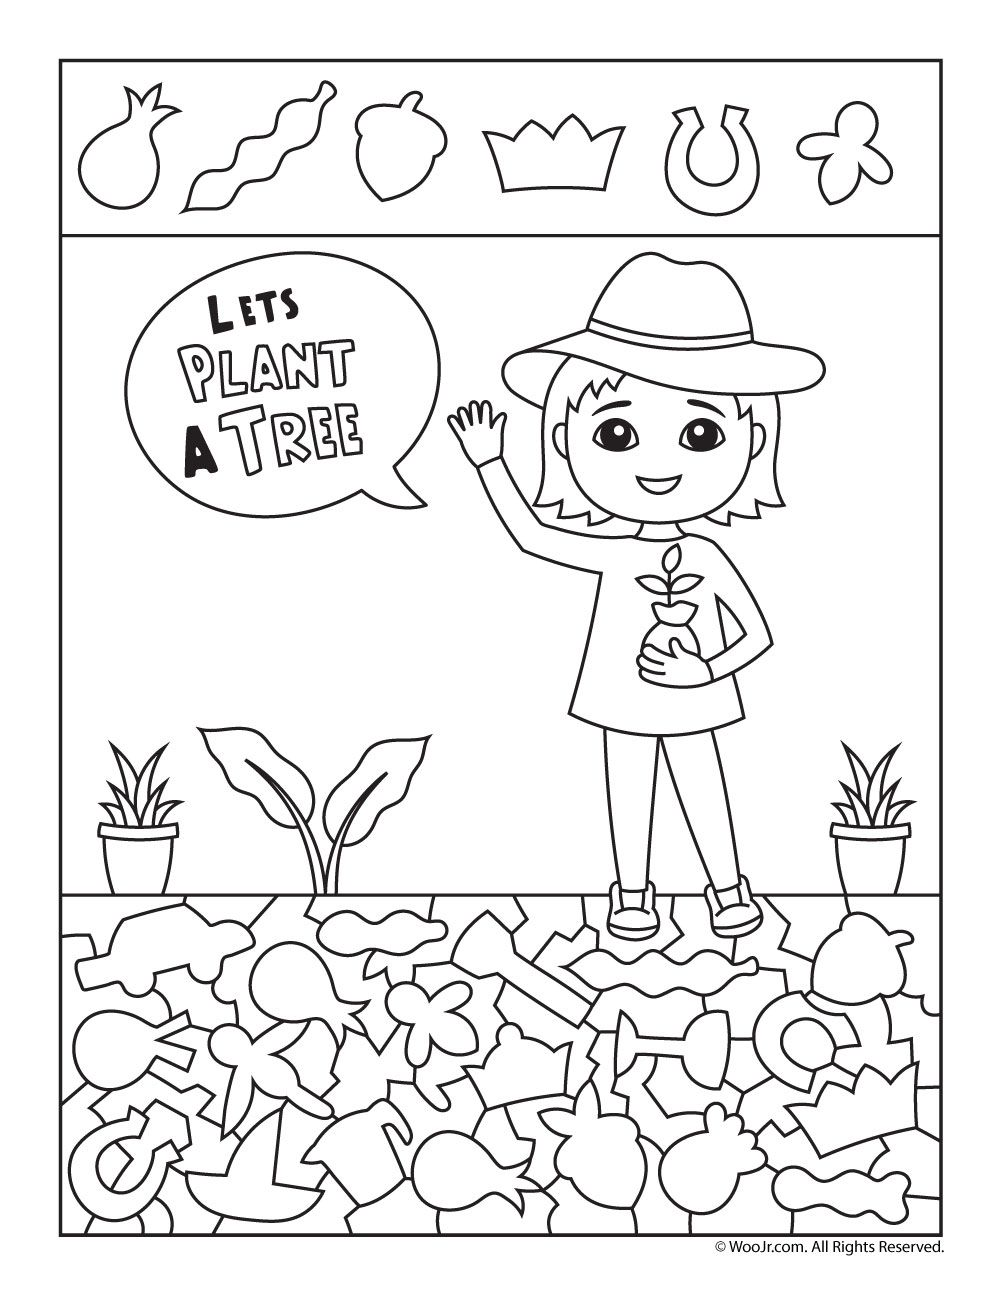 Tree Planting Hidden Picture Game Woo Jr Kids Activities Hidden Pictures Trees To Plant Hidden Pictures Printables [ 1296 x 1000 Pixel ]